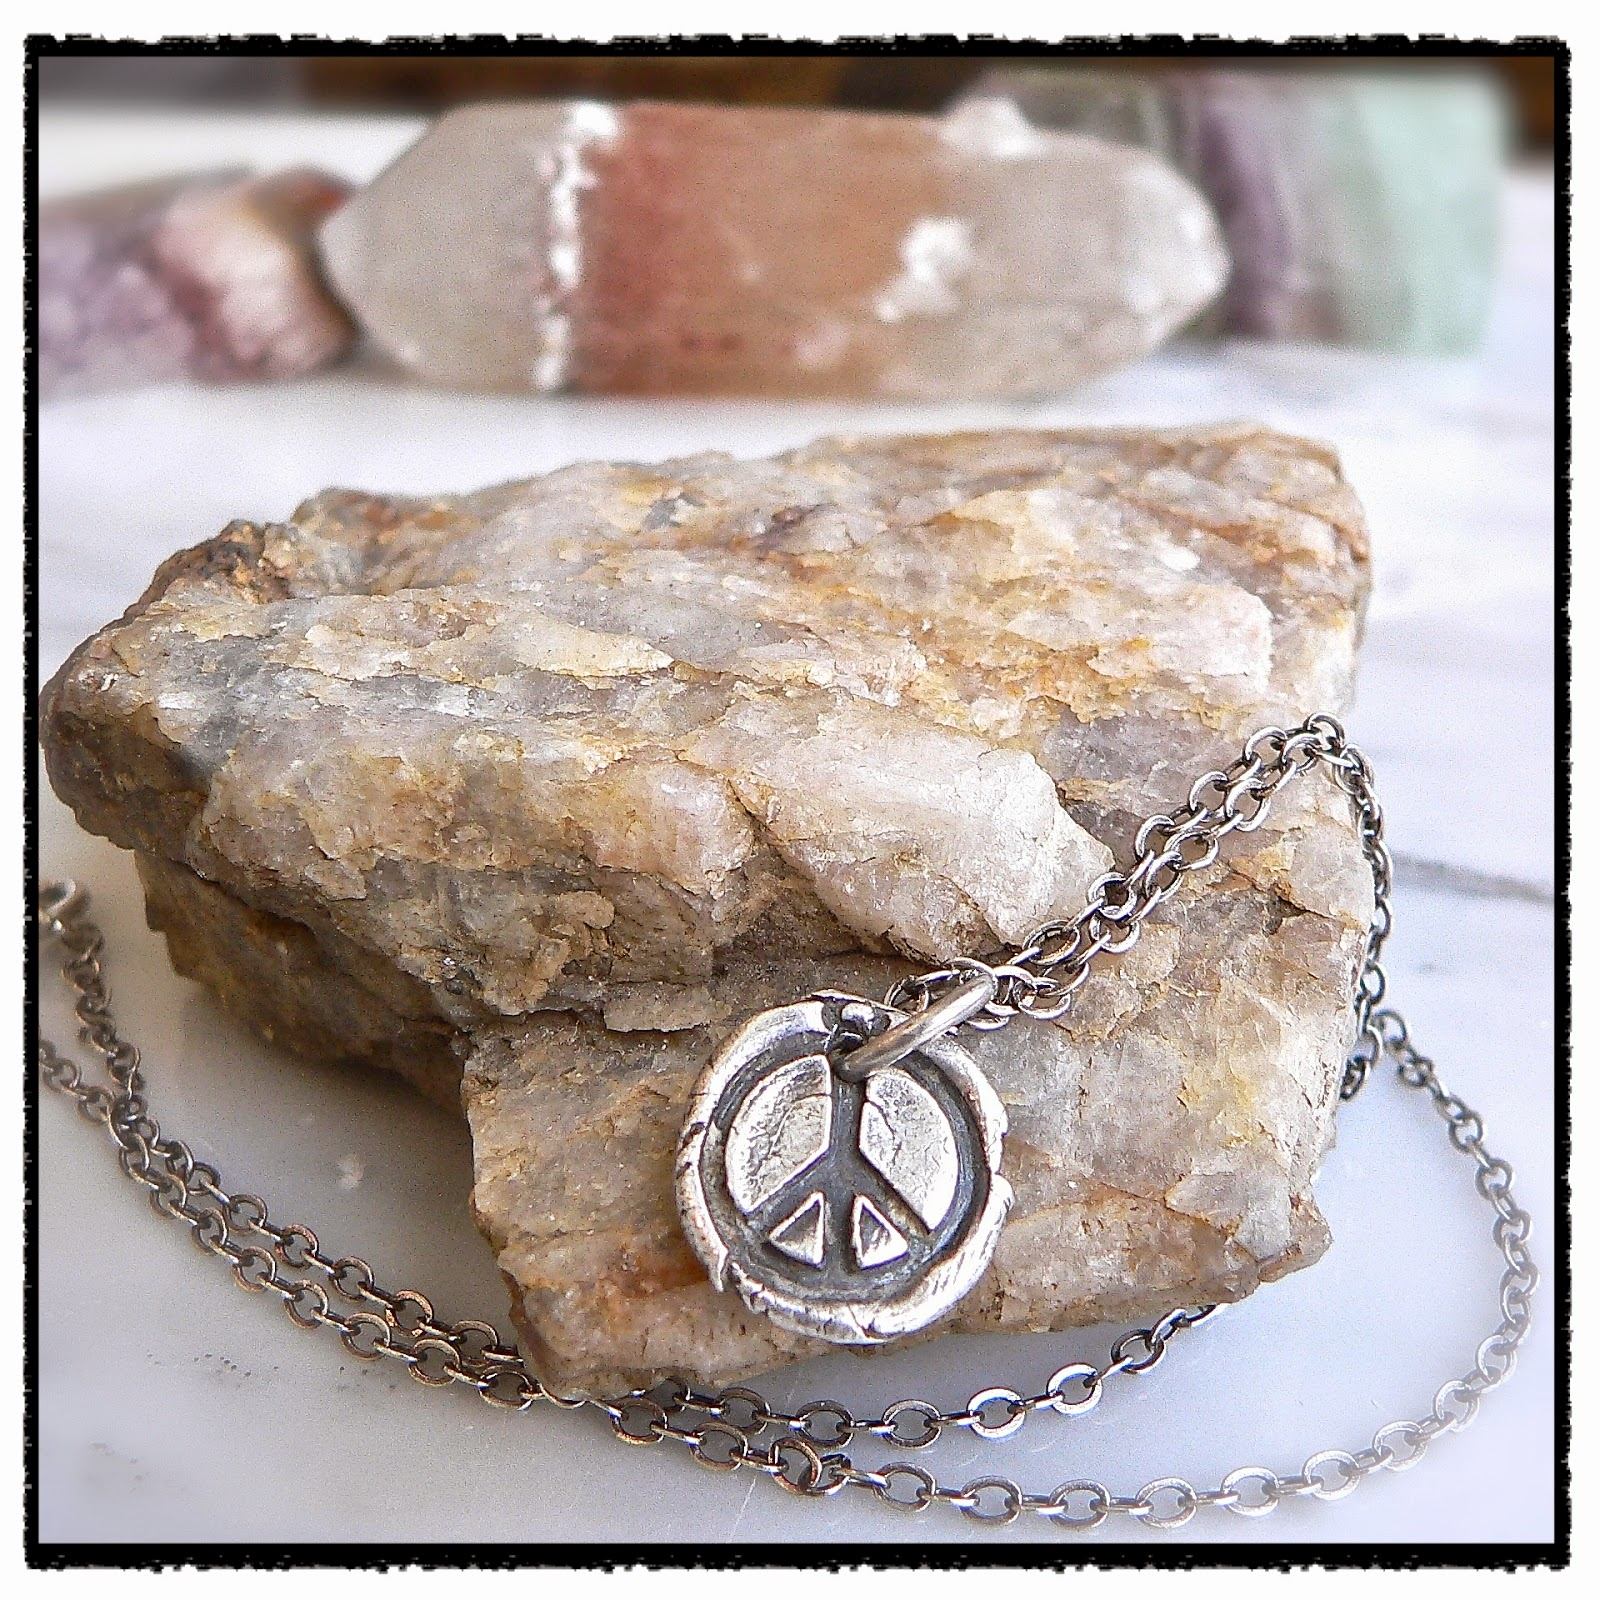 "<img src=""wax seal  Peace Sign necklace - Petite Peace Sign wax seal necklace  from Your Daily Jewels.jpeg"" alt= ""Antique wax seal Proverb pendants"">"